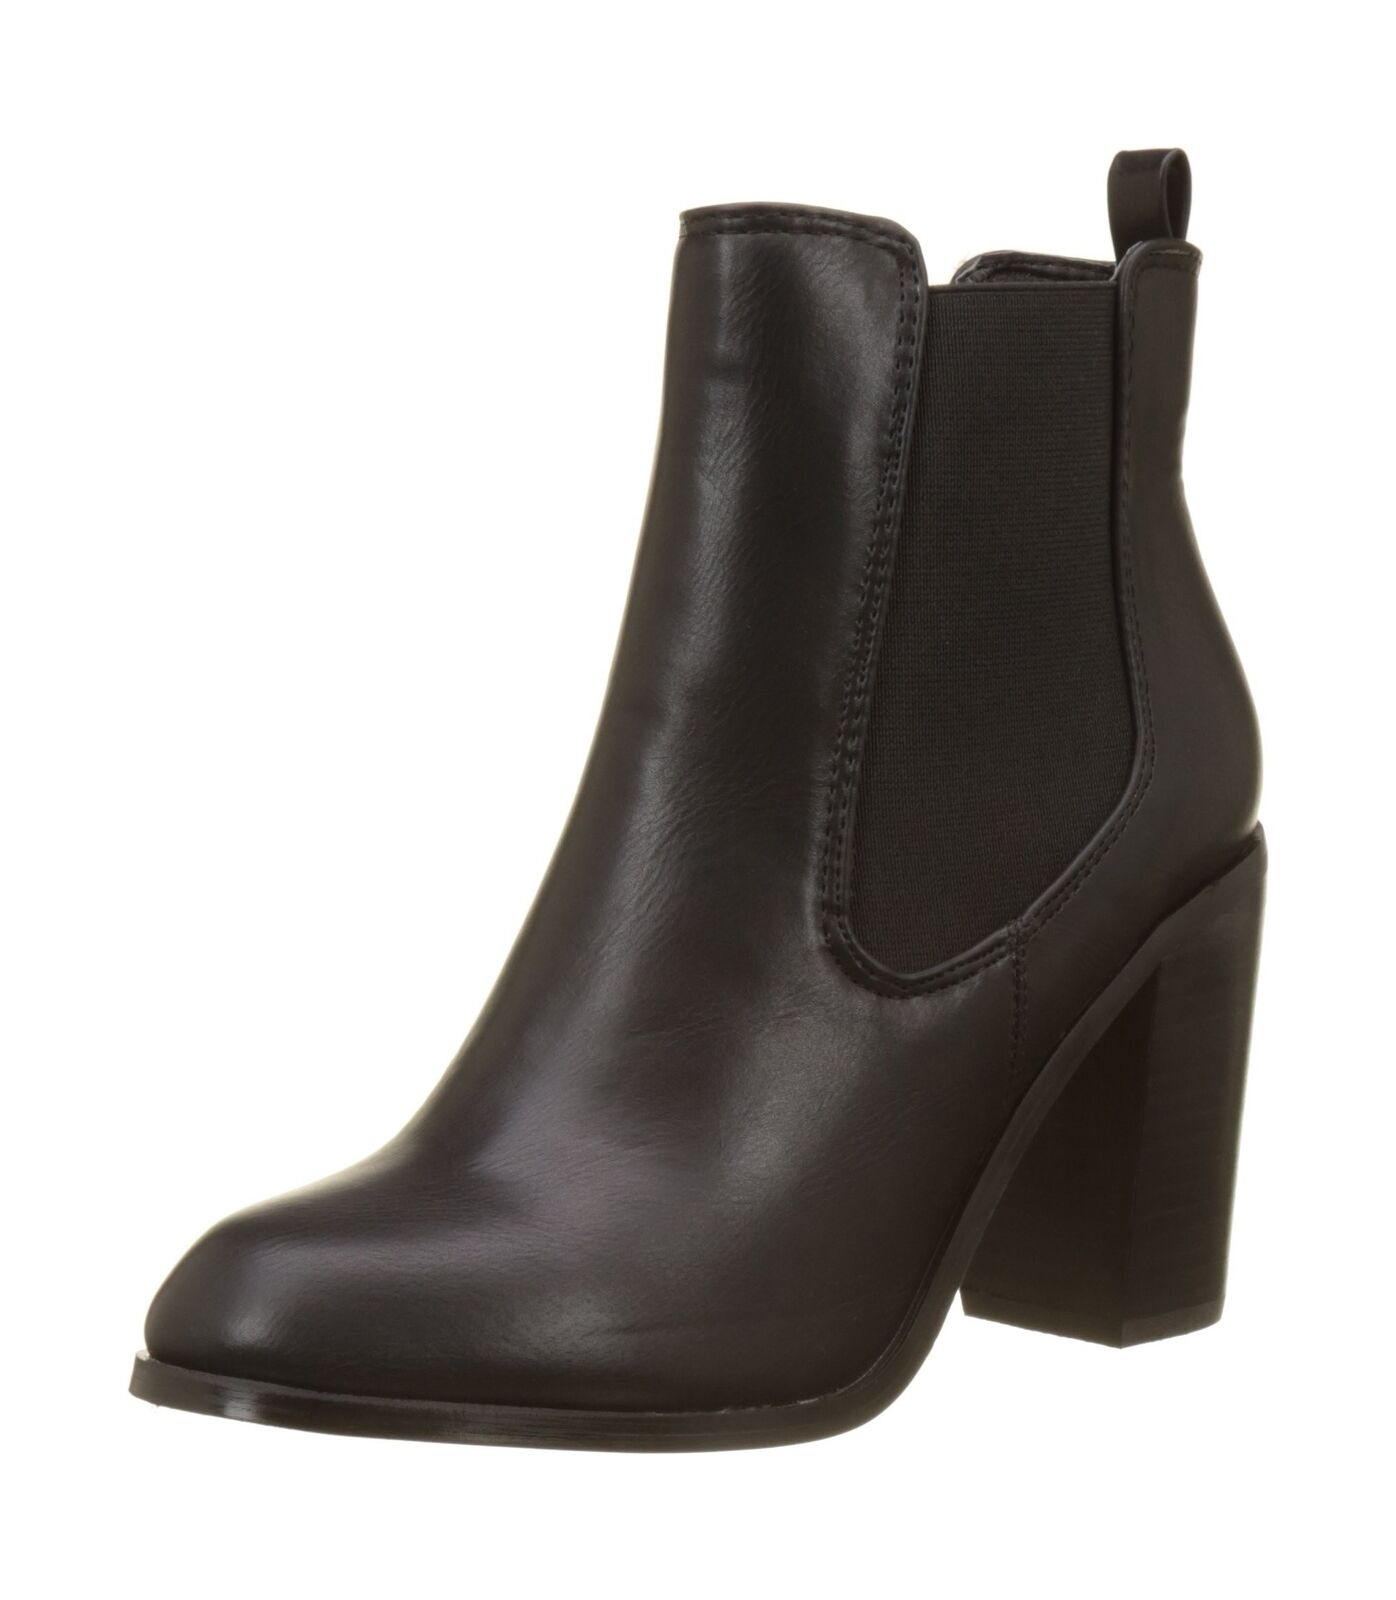 Buffalo Femme'S 333786 GM S10234 nappa Bottines Chelsea Noir (Noir 01 00) UK 3